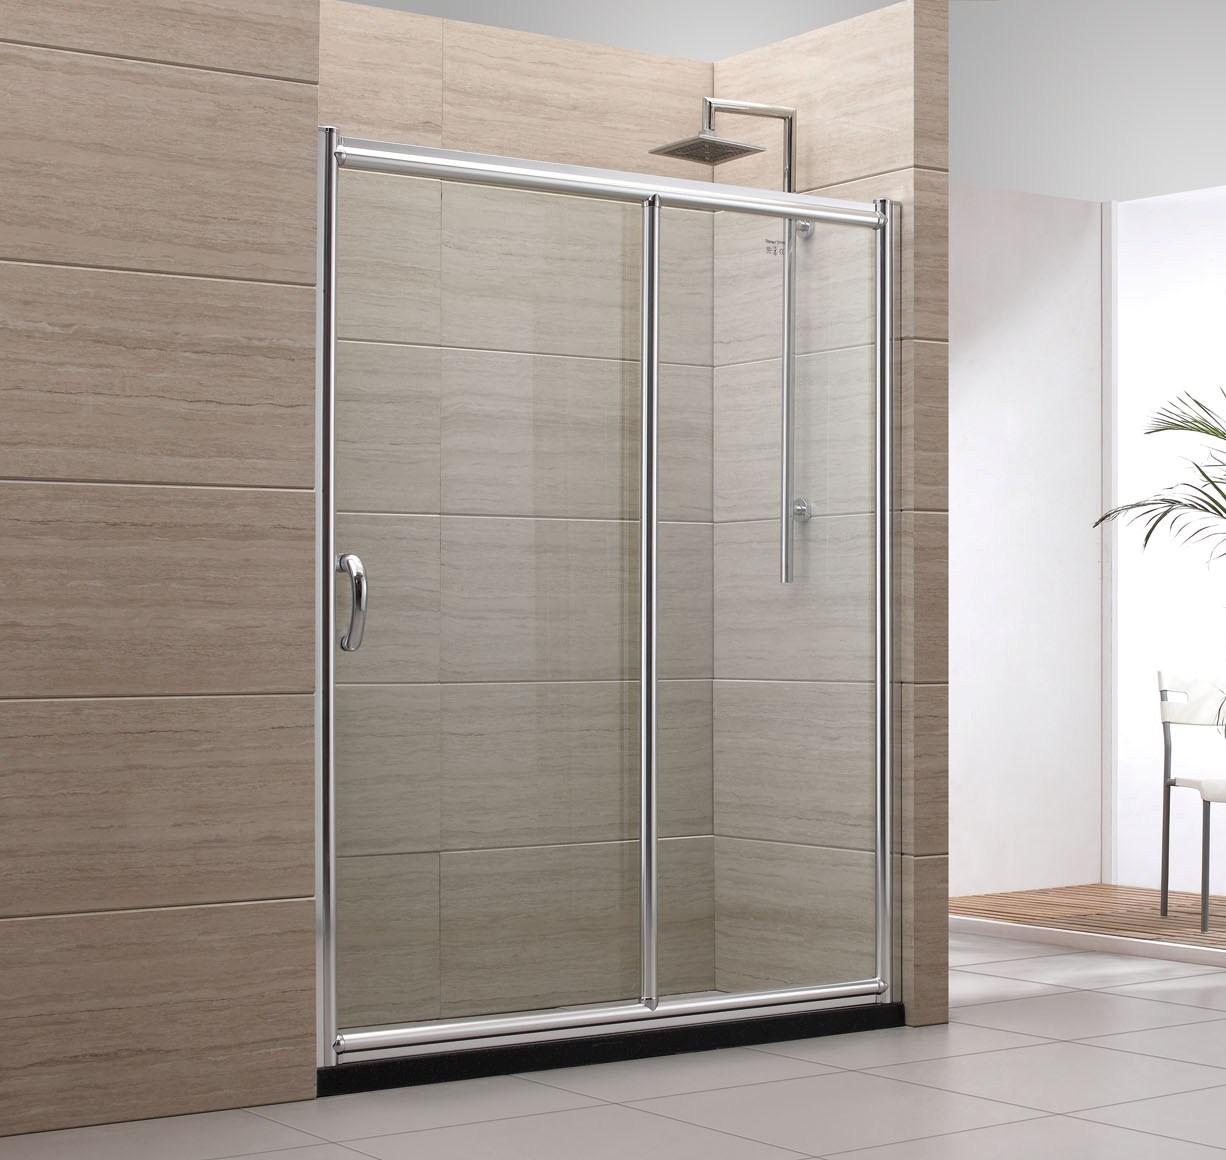 Bathroom Shower Partition Customize Bathroom Screen Sliding Door